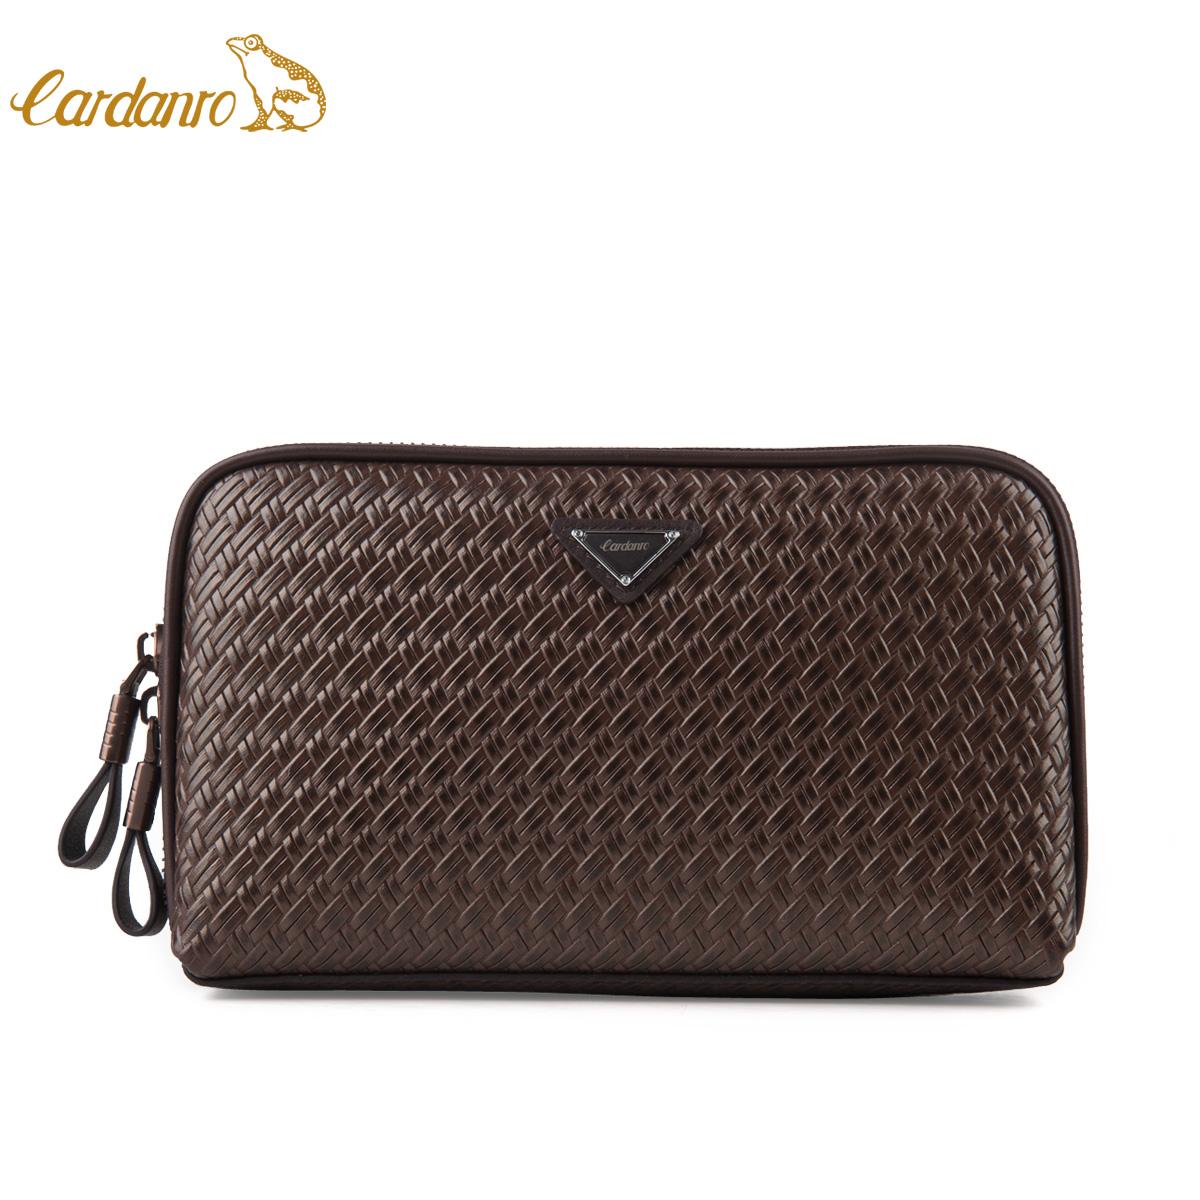 сумка Cardanro 2008